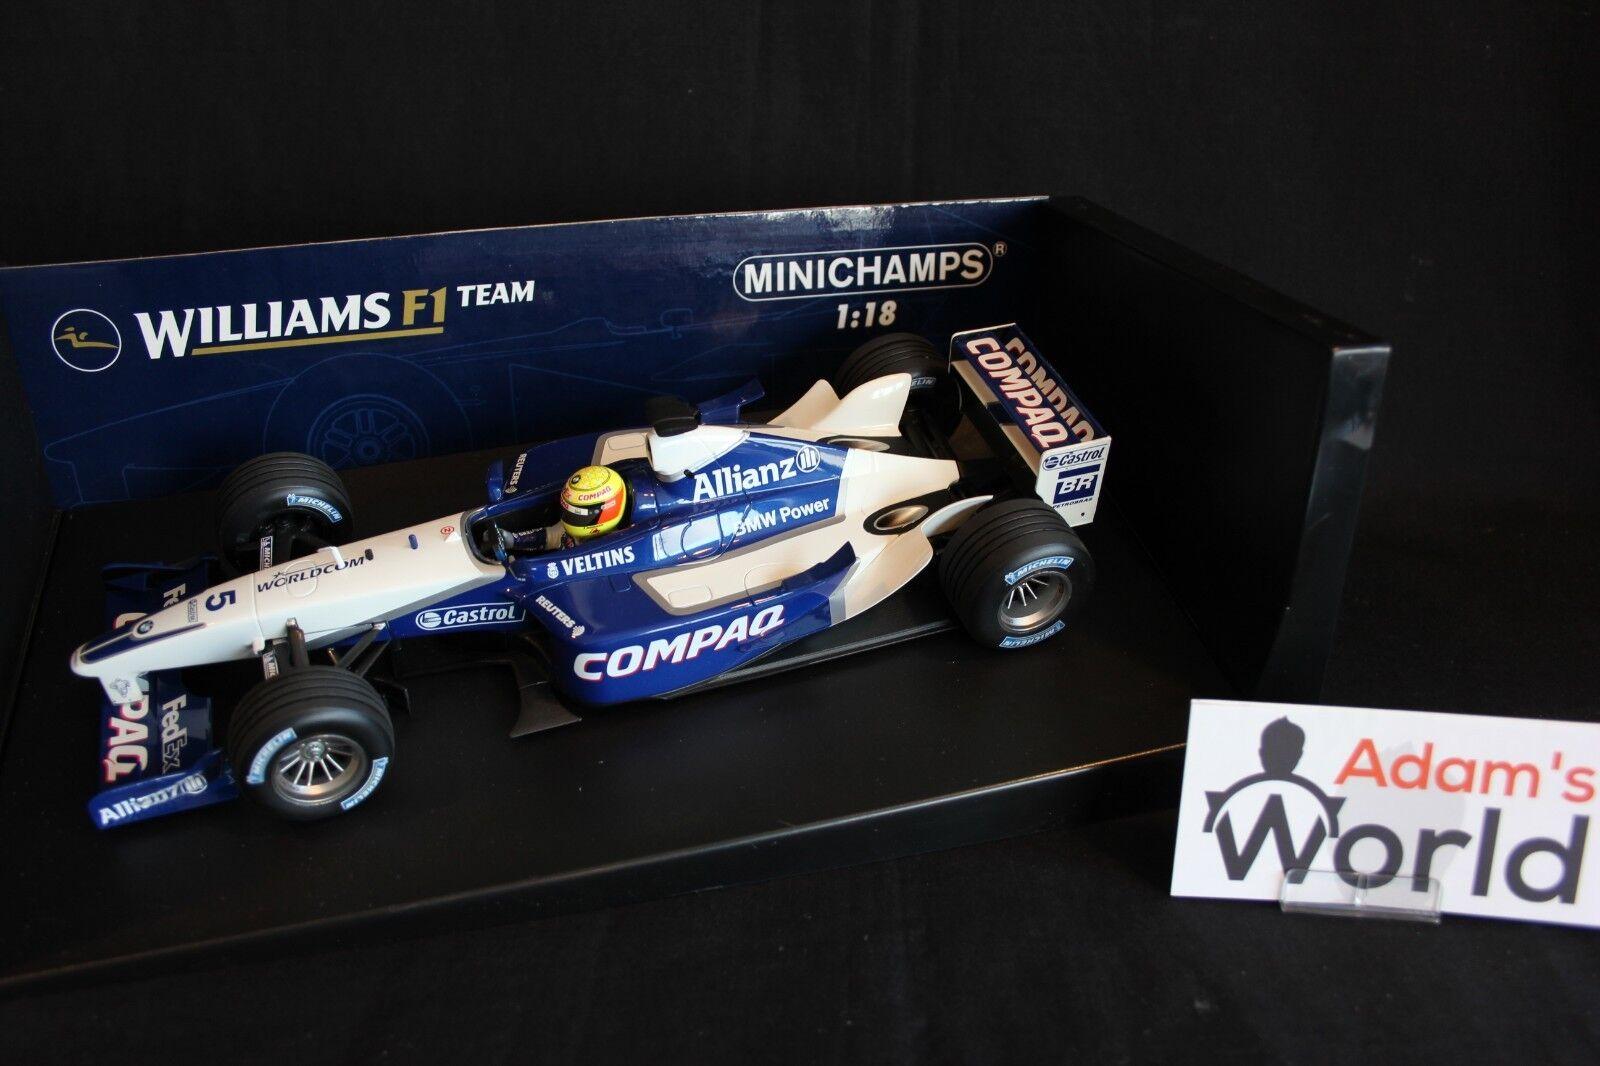 Minichamps Williams BMW FW23 2001 1 18  5 Ralf Schumacher (GER) 1st GP Win